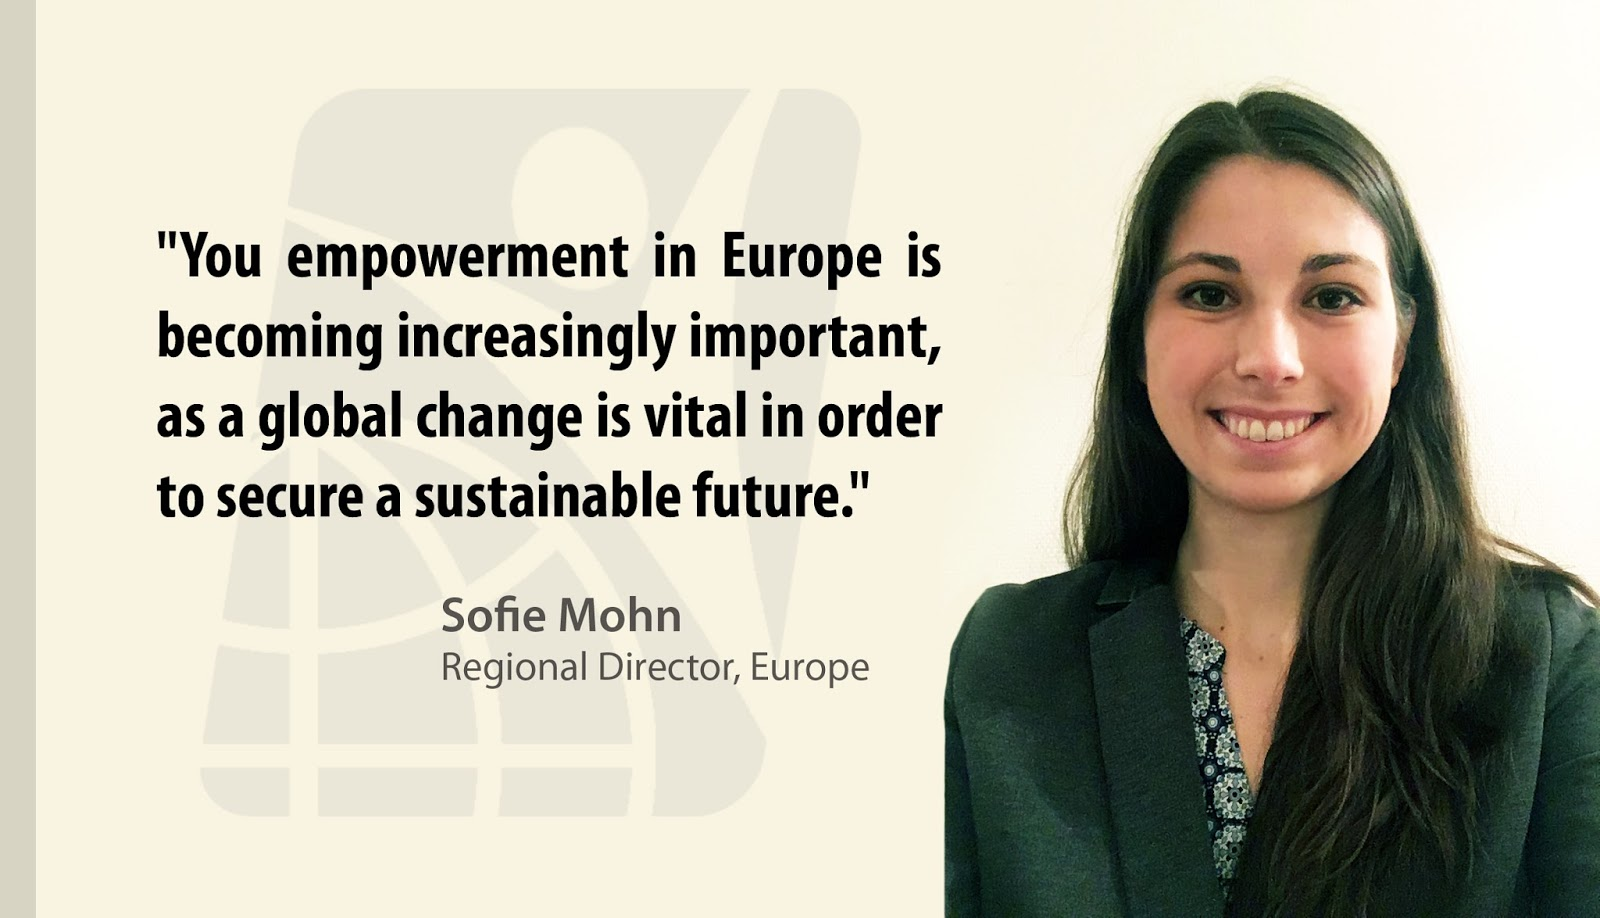 Sofie Mohn, IYF Regional Director, Europe